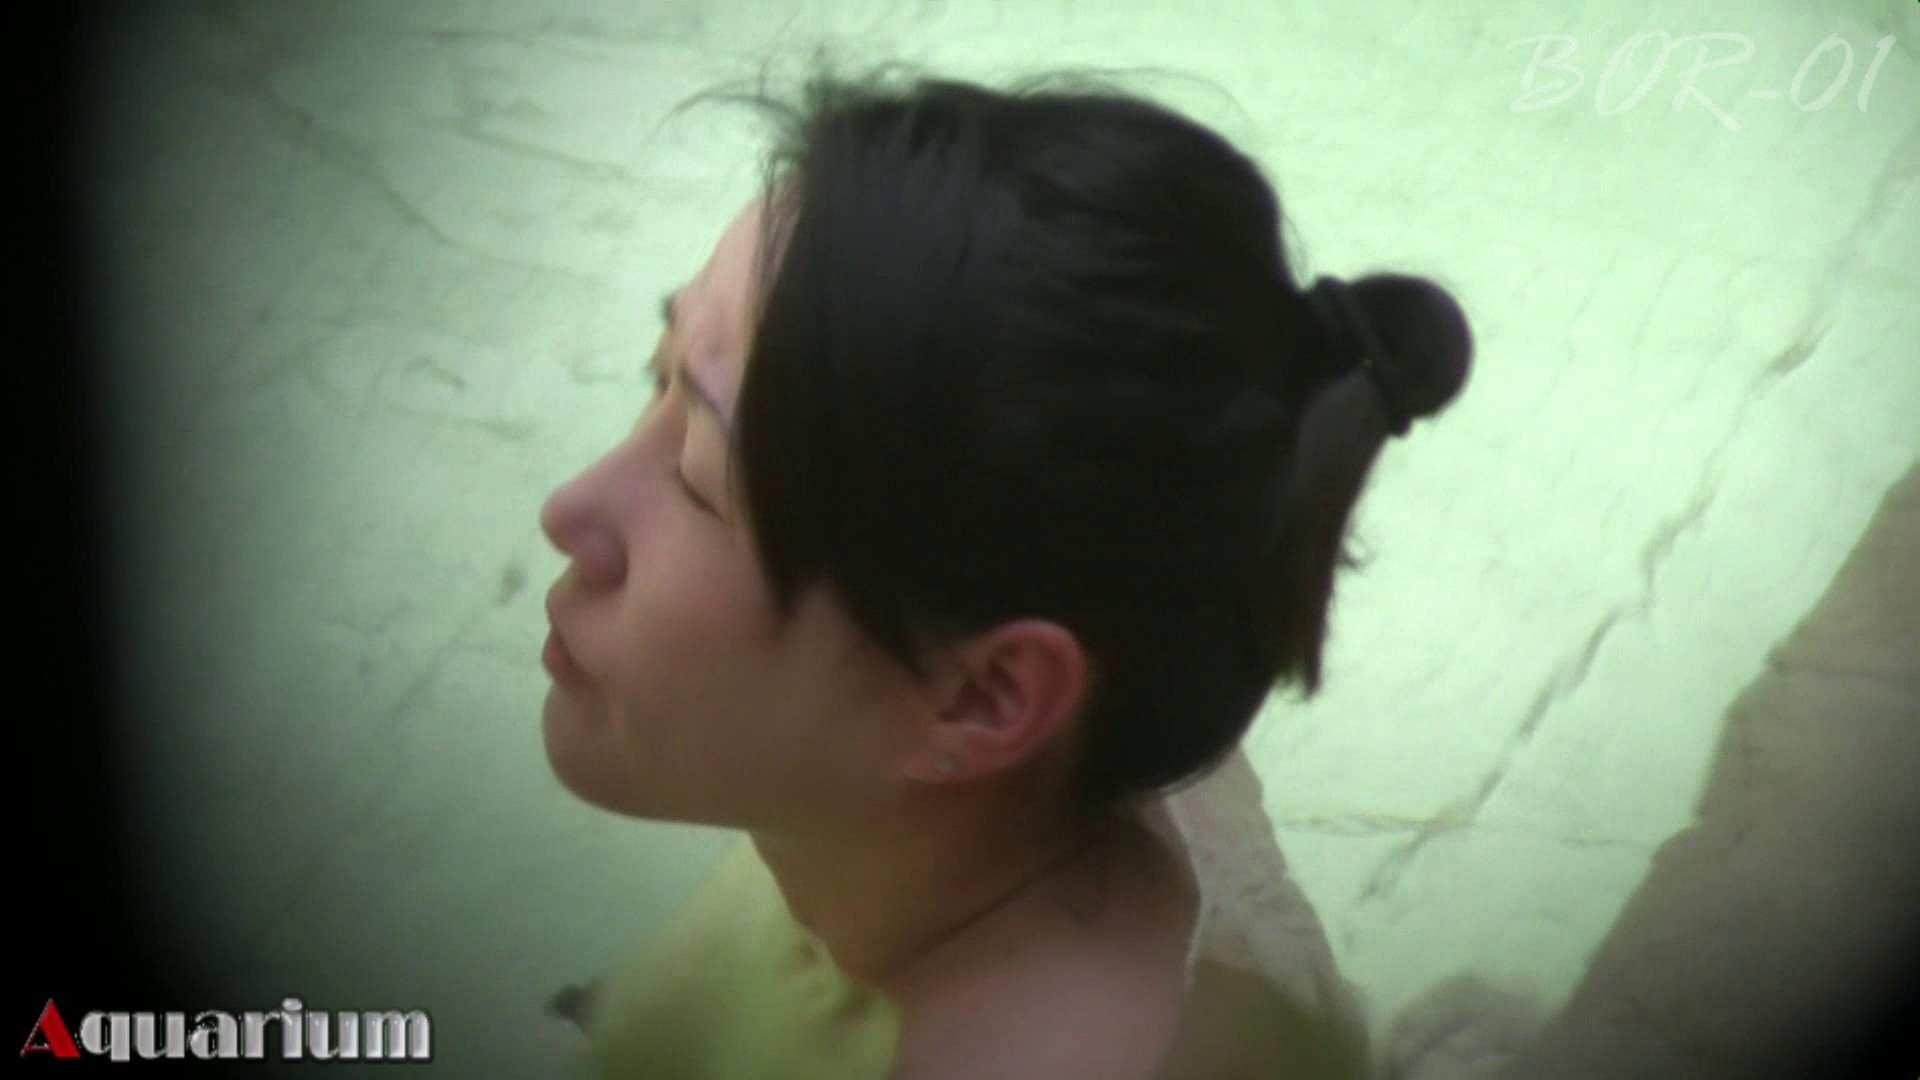 Aquaな露天風呂Vol.461 エッチな盗撮 AV無料動画キャプチャ 108pic 39